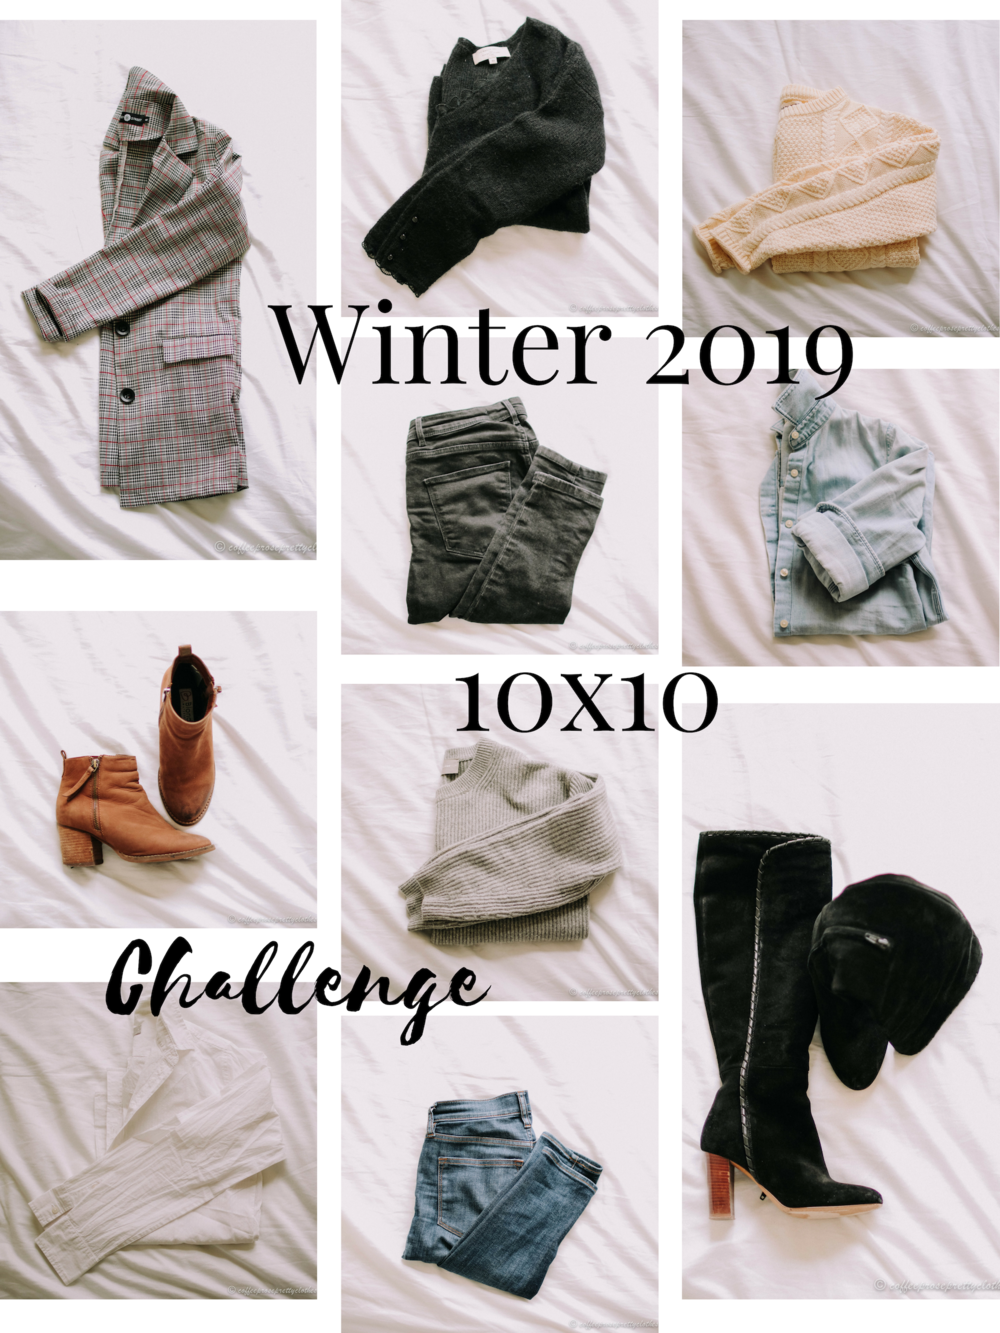 Winter 2019 10x10 Challenge